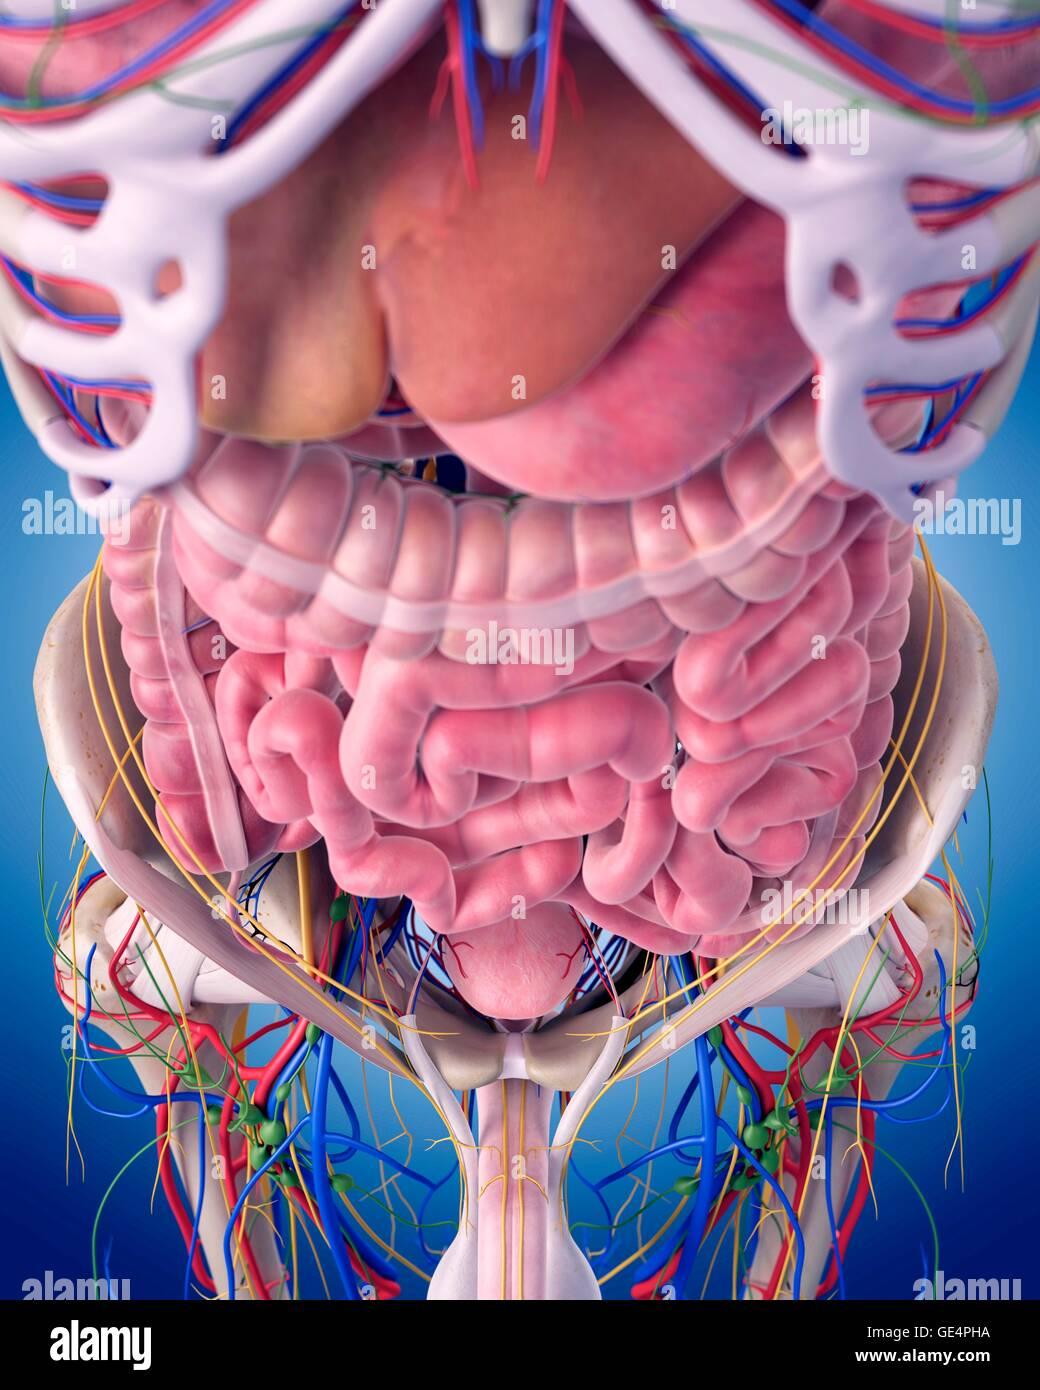 Human Abdominal Anatomy Illustration Stock Photos Human Abdominal